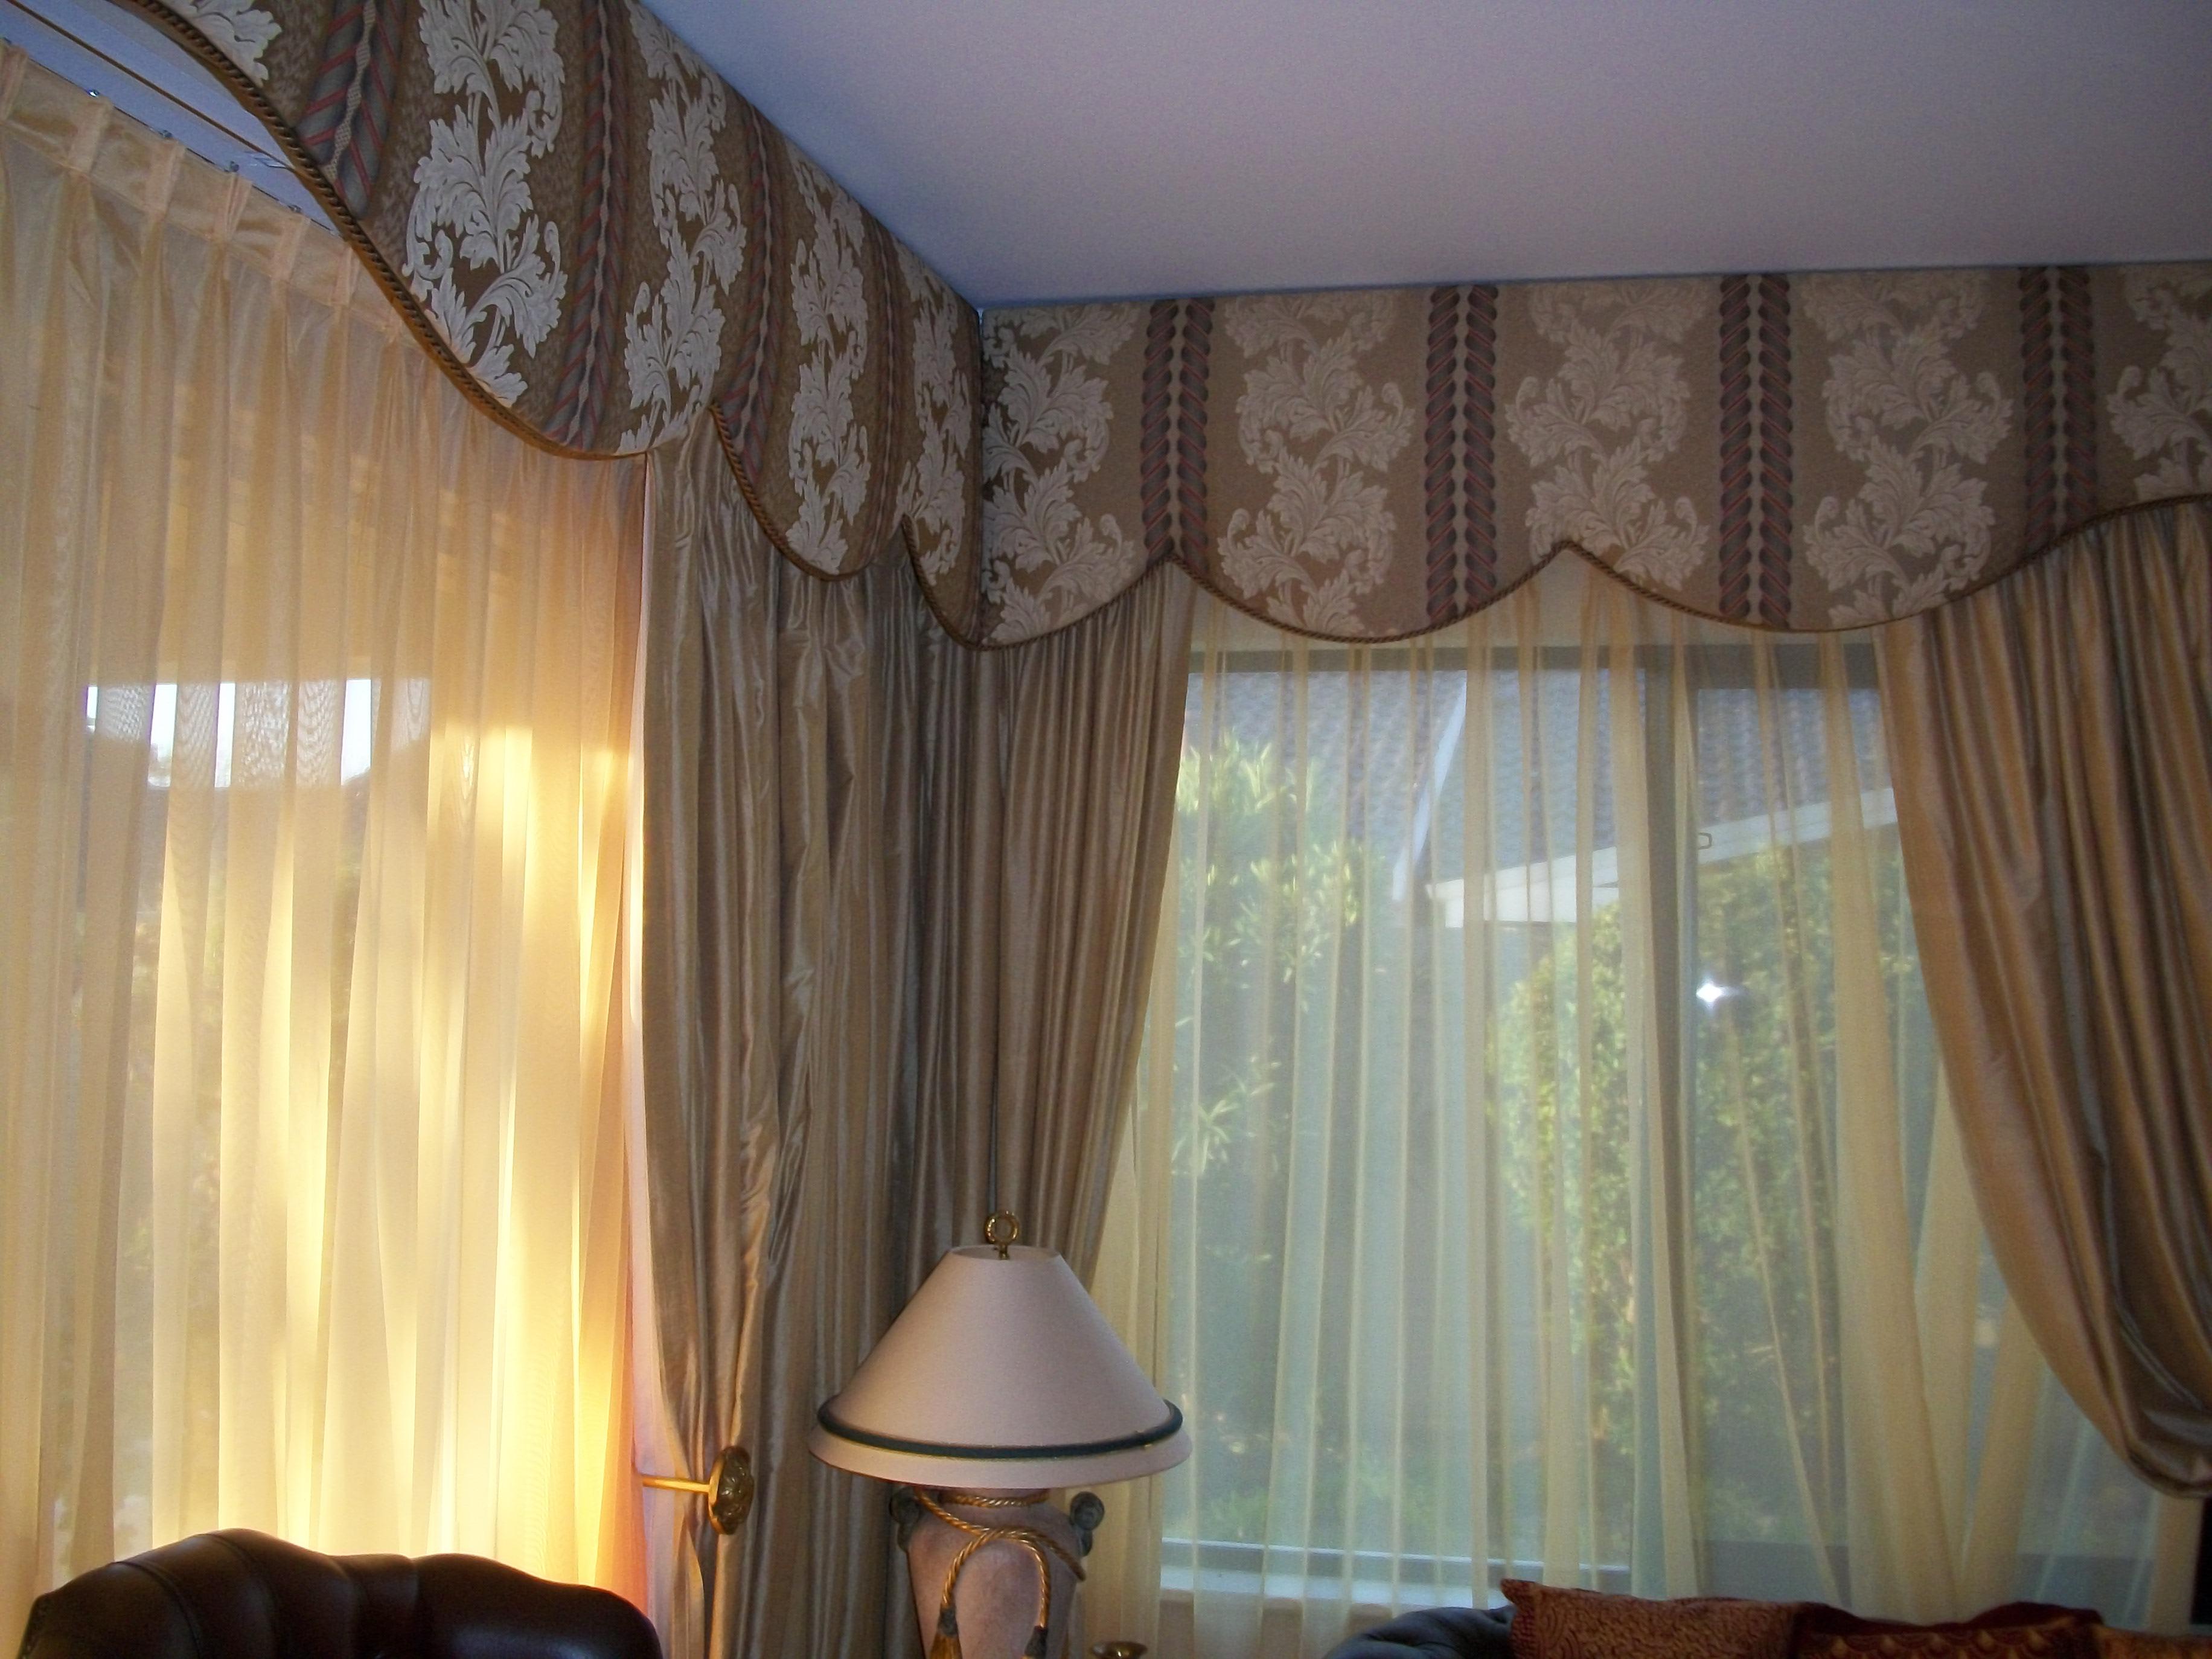 ����� ����� ٢٠١٥ Modern-Elegant-Curtain-Designs-2.jpg